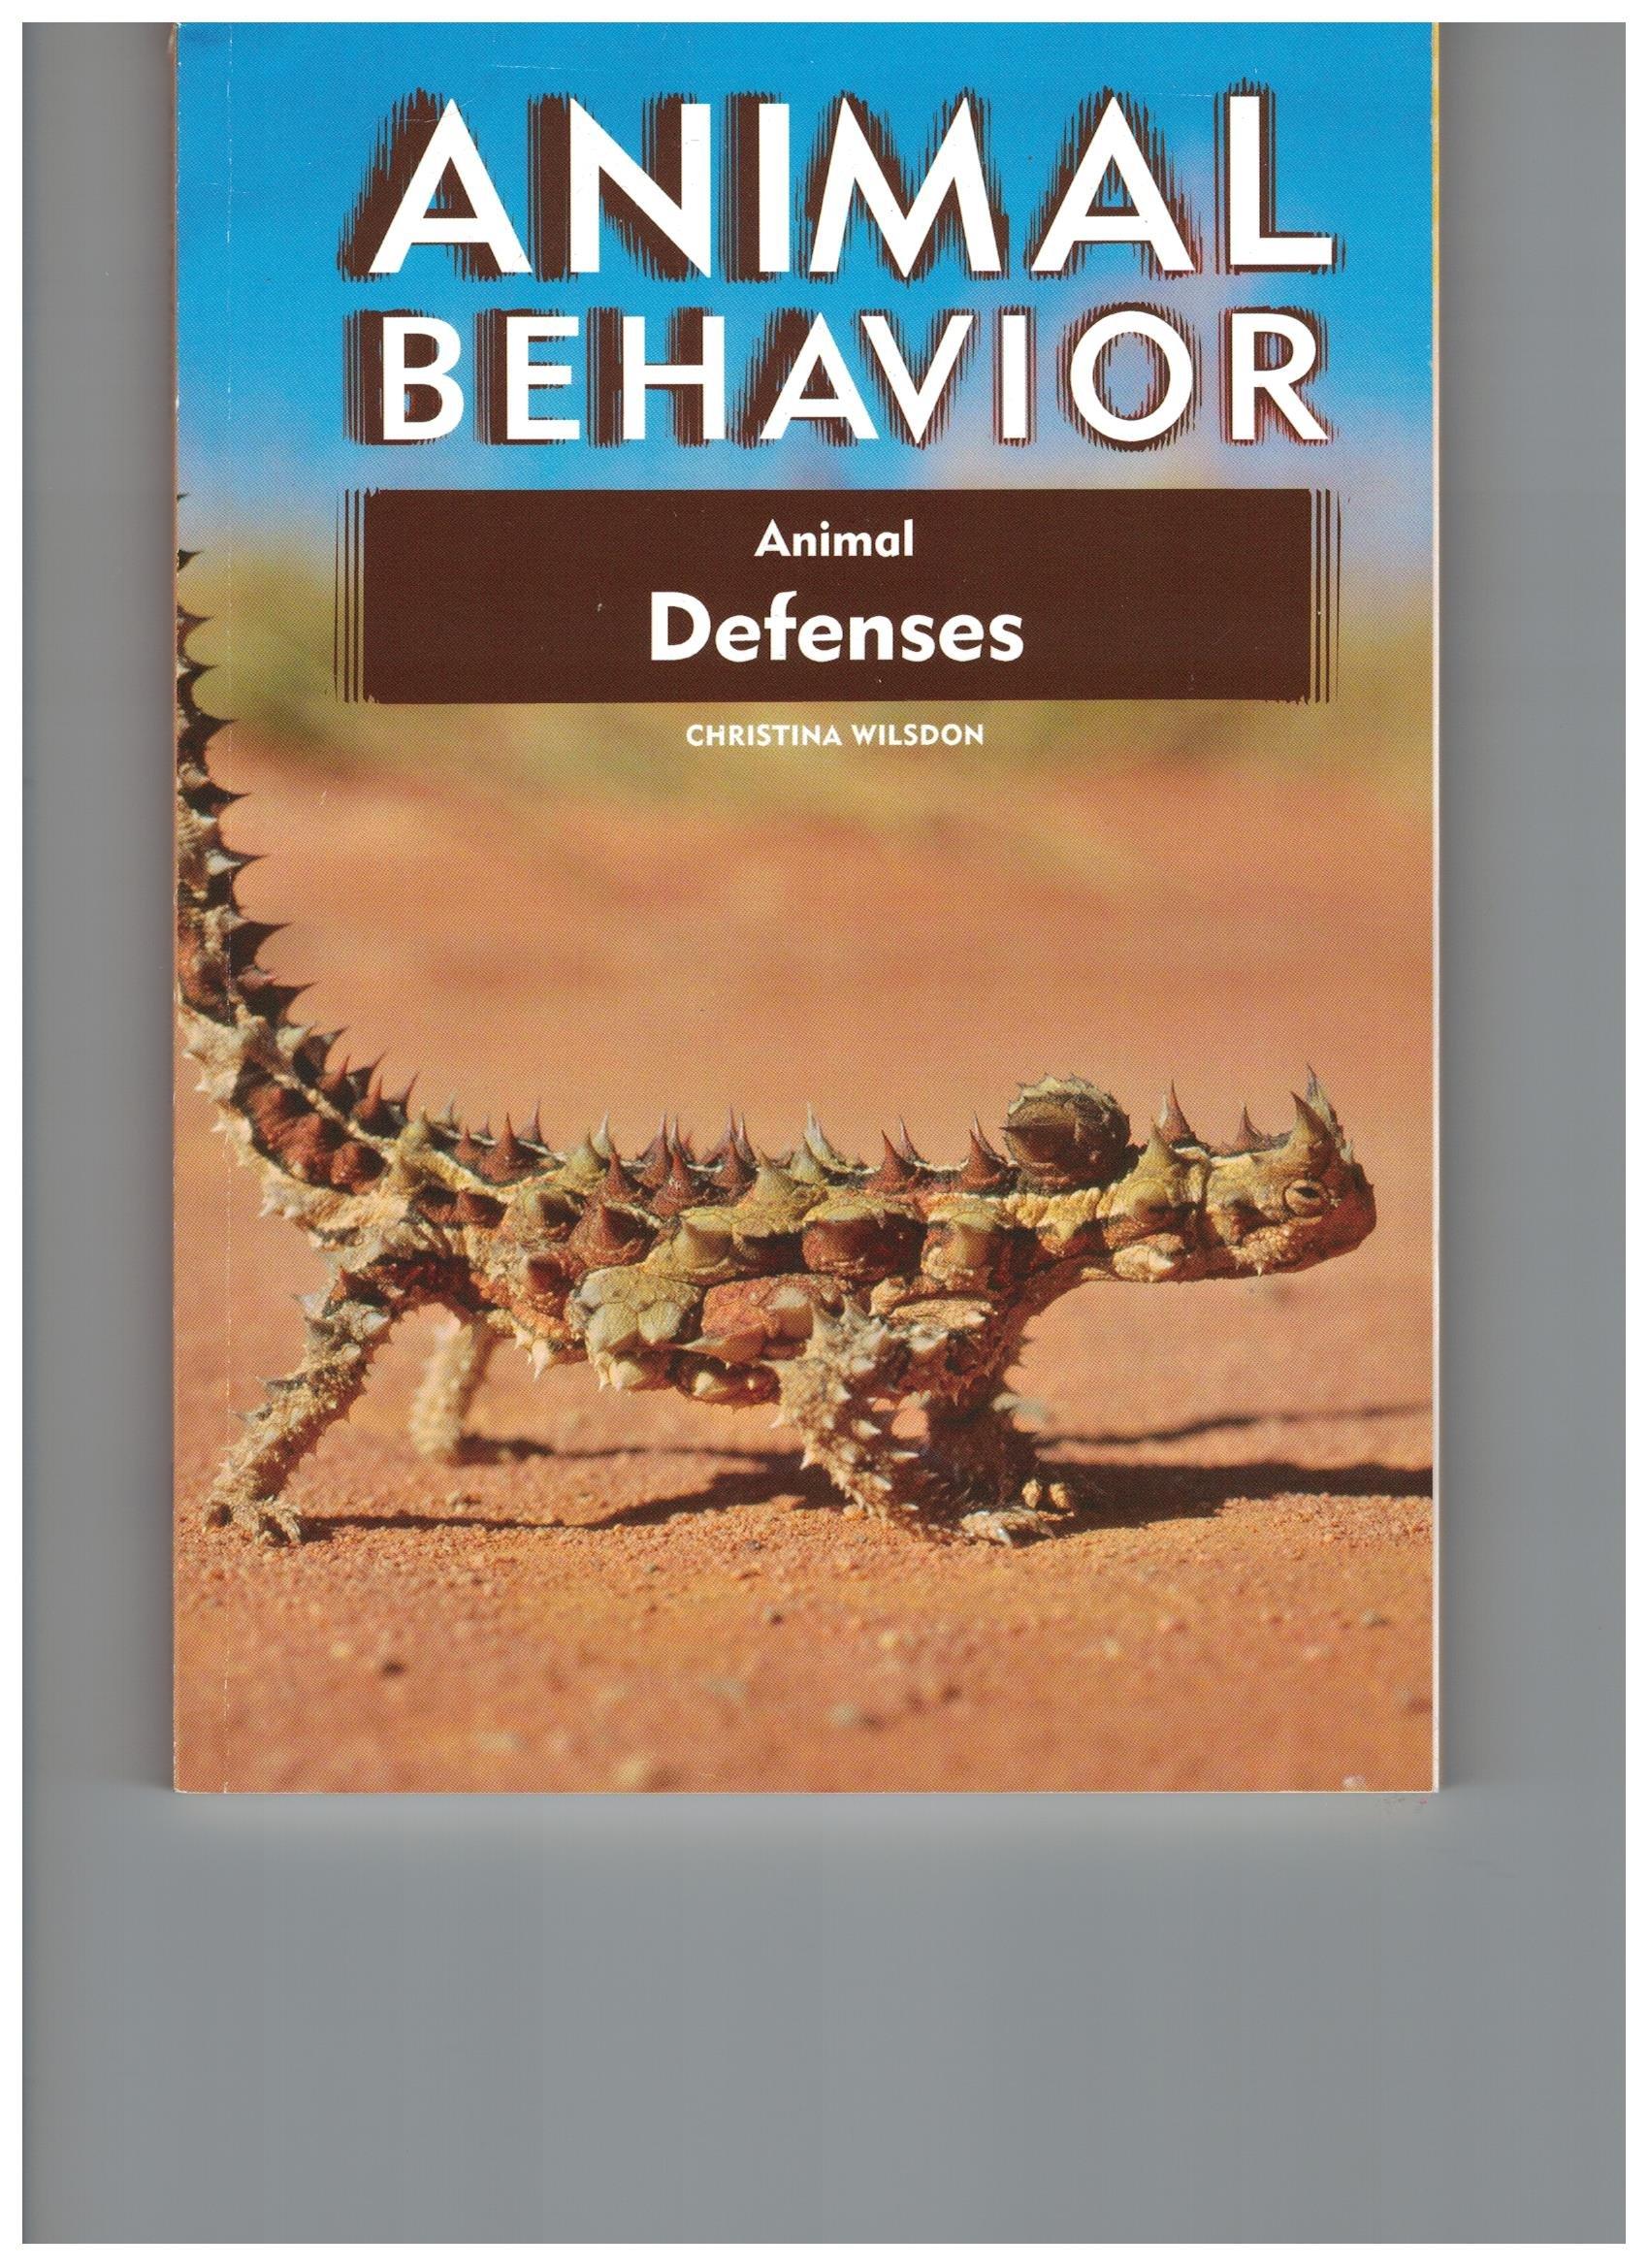 Animal Defenses (Animal Behavior) by Chelsea House Pub